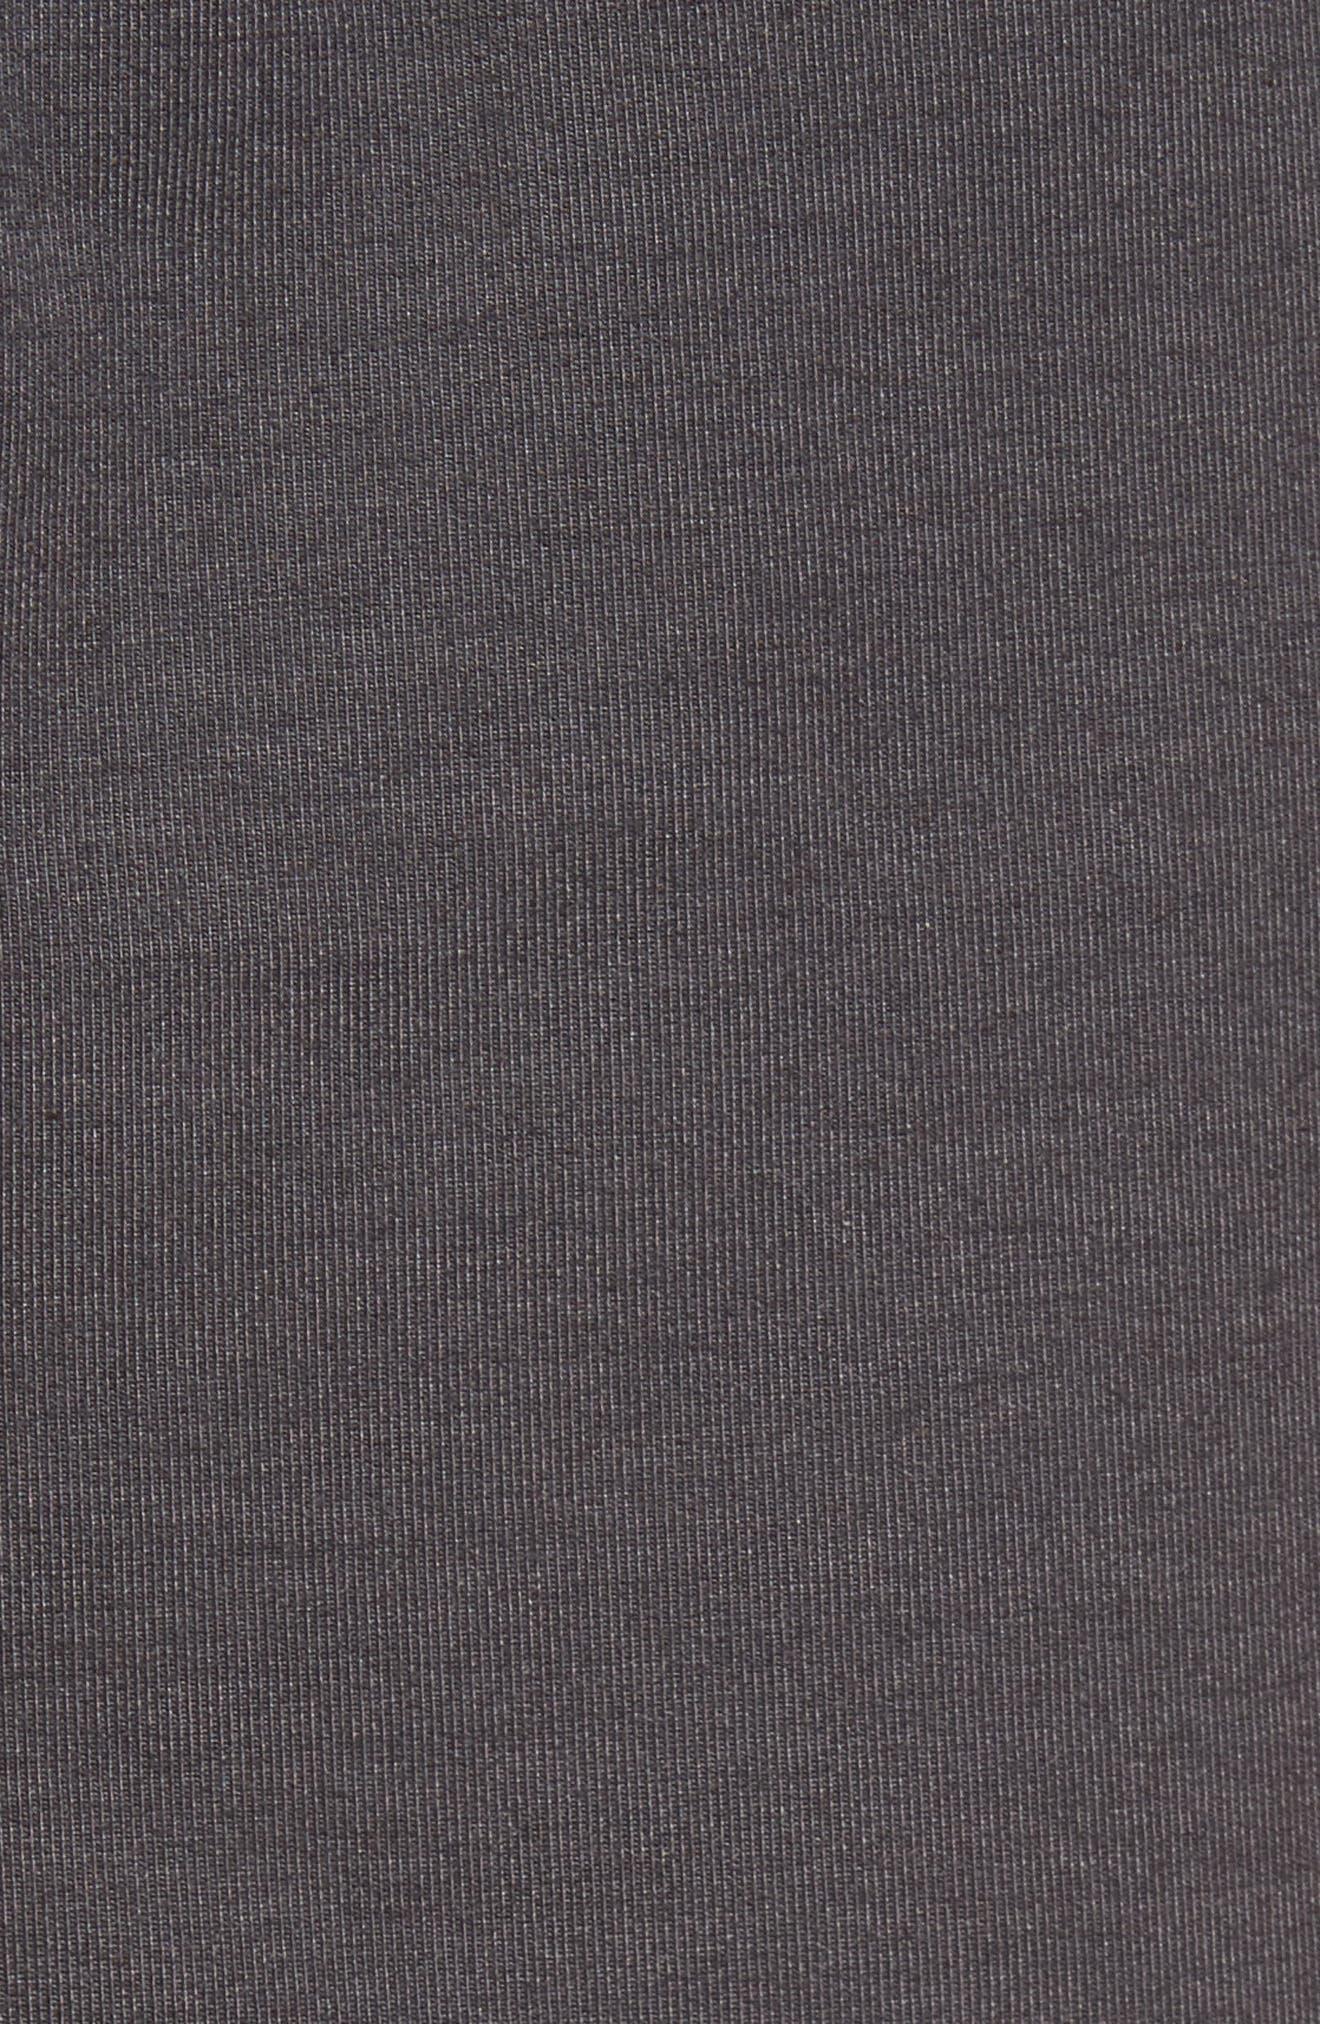 Alternate Image 5  - O'Neill Traveler Fleece Shorts